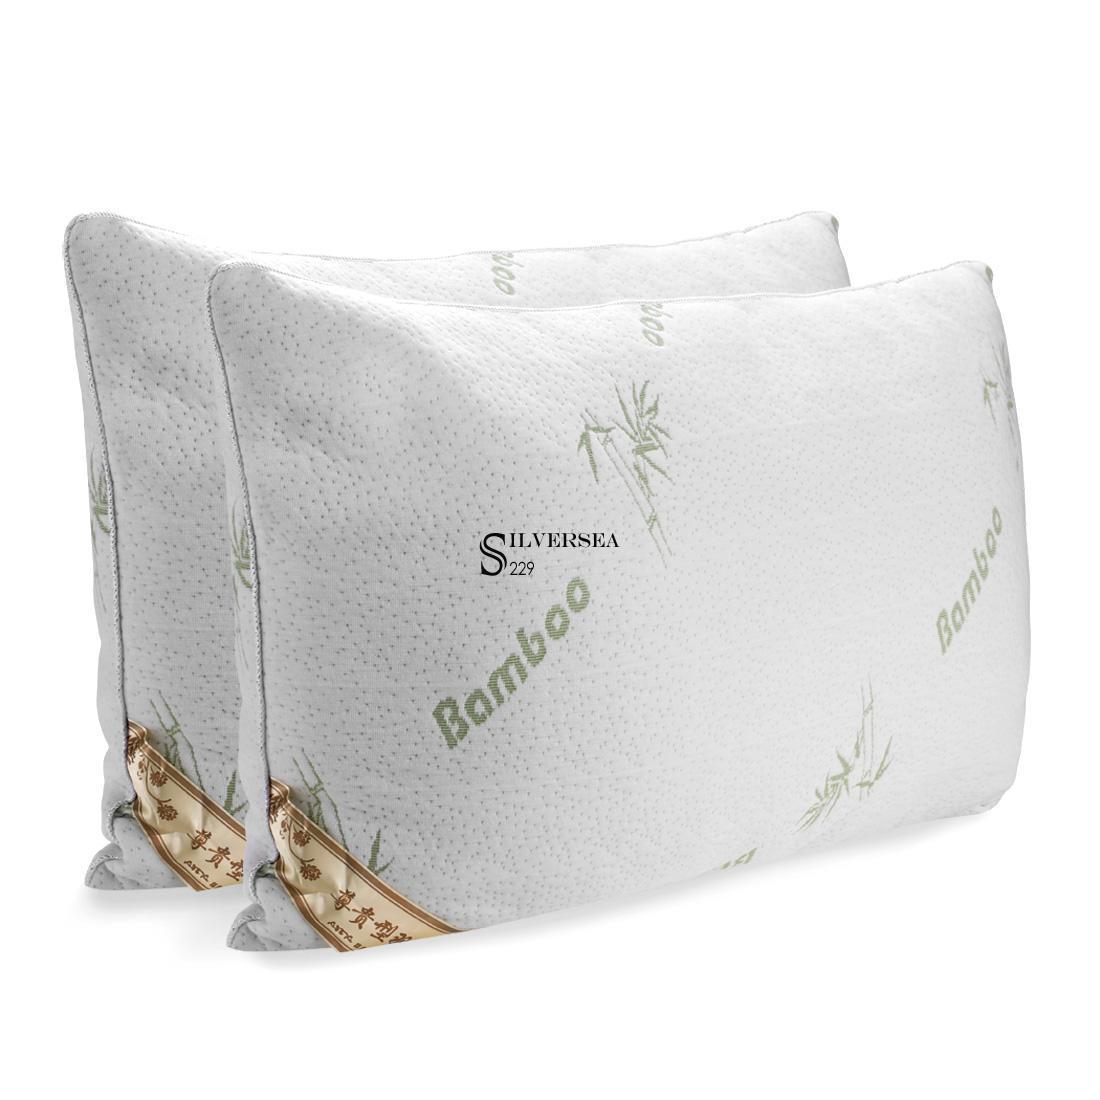 2 Pcs White Cervical Protection Polyest Fiber Bamboo